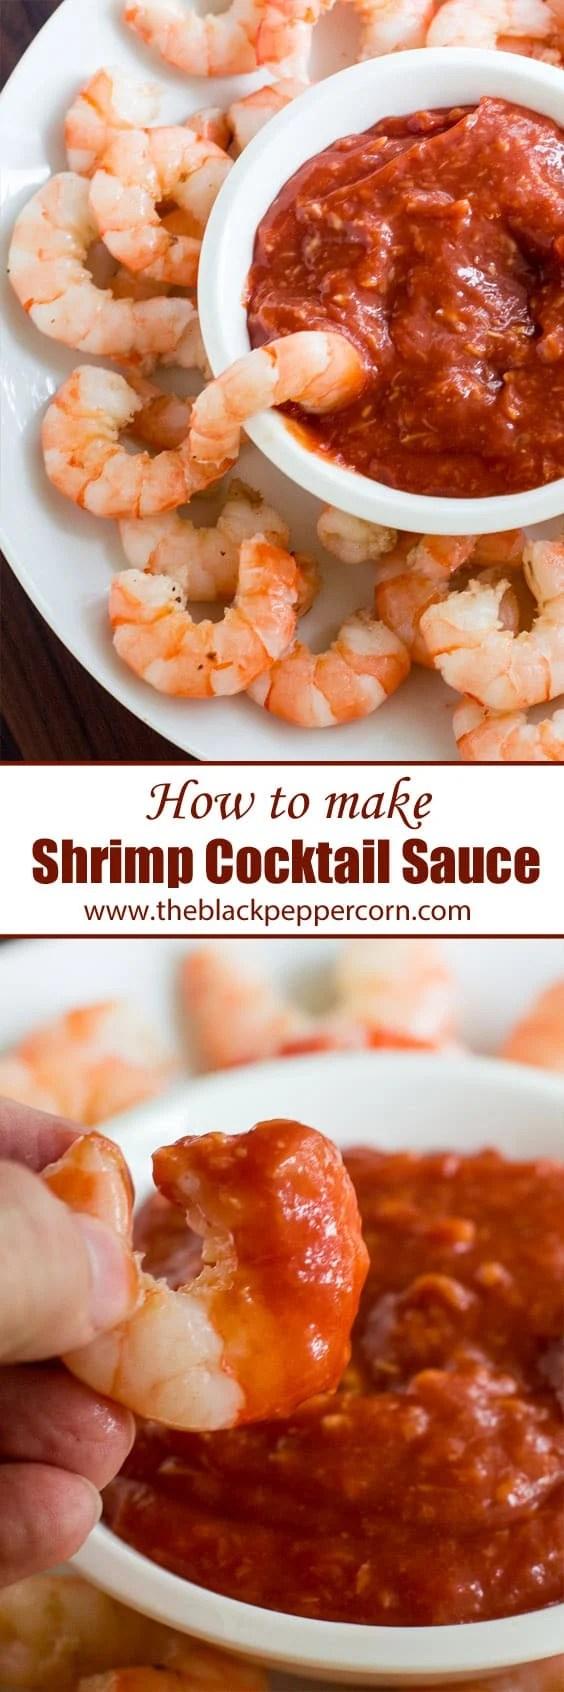 Shrimp Cocktail Sauce Recipe Seafood Easy Classic